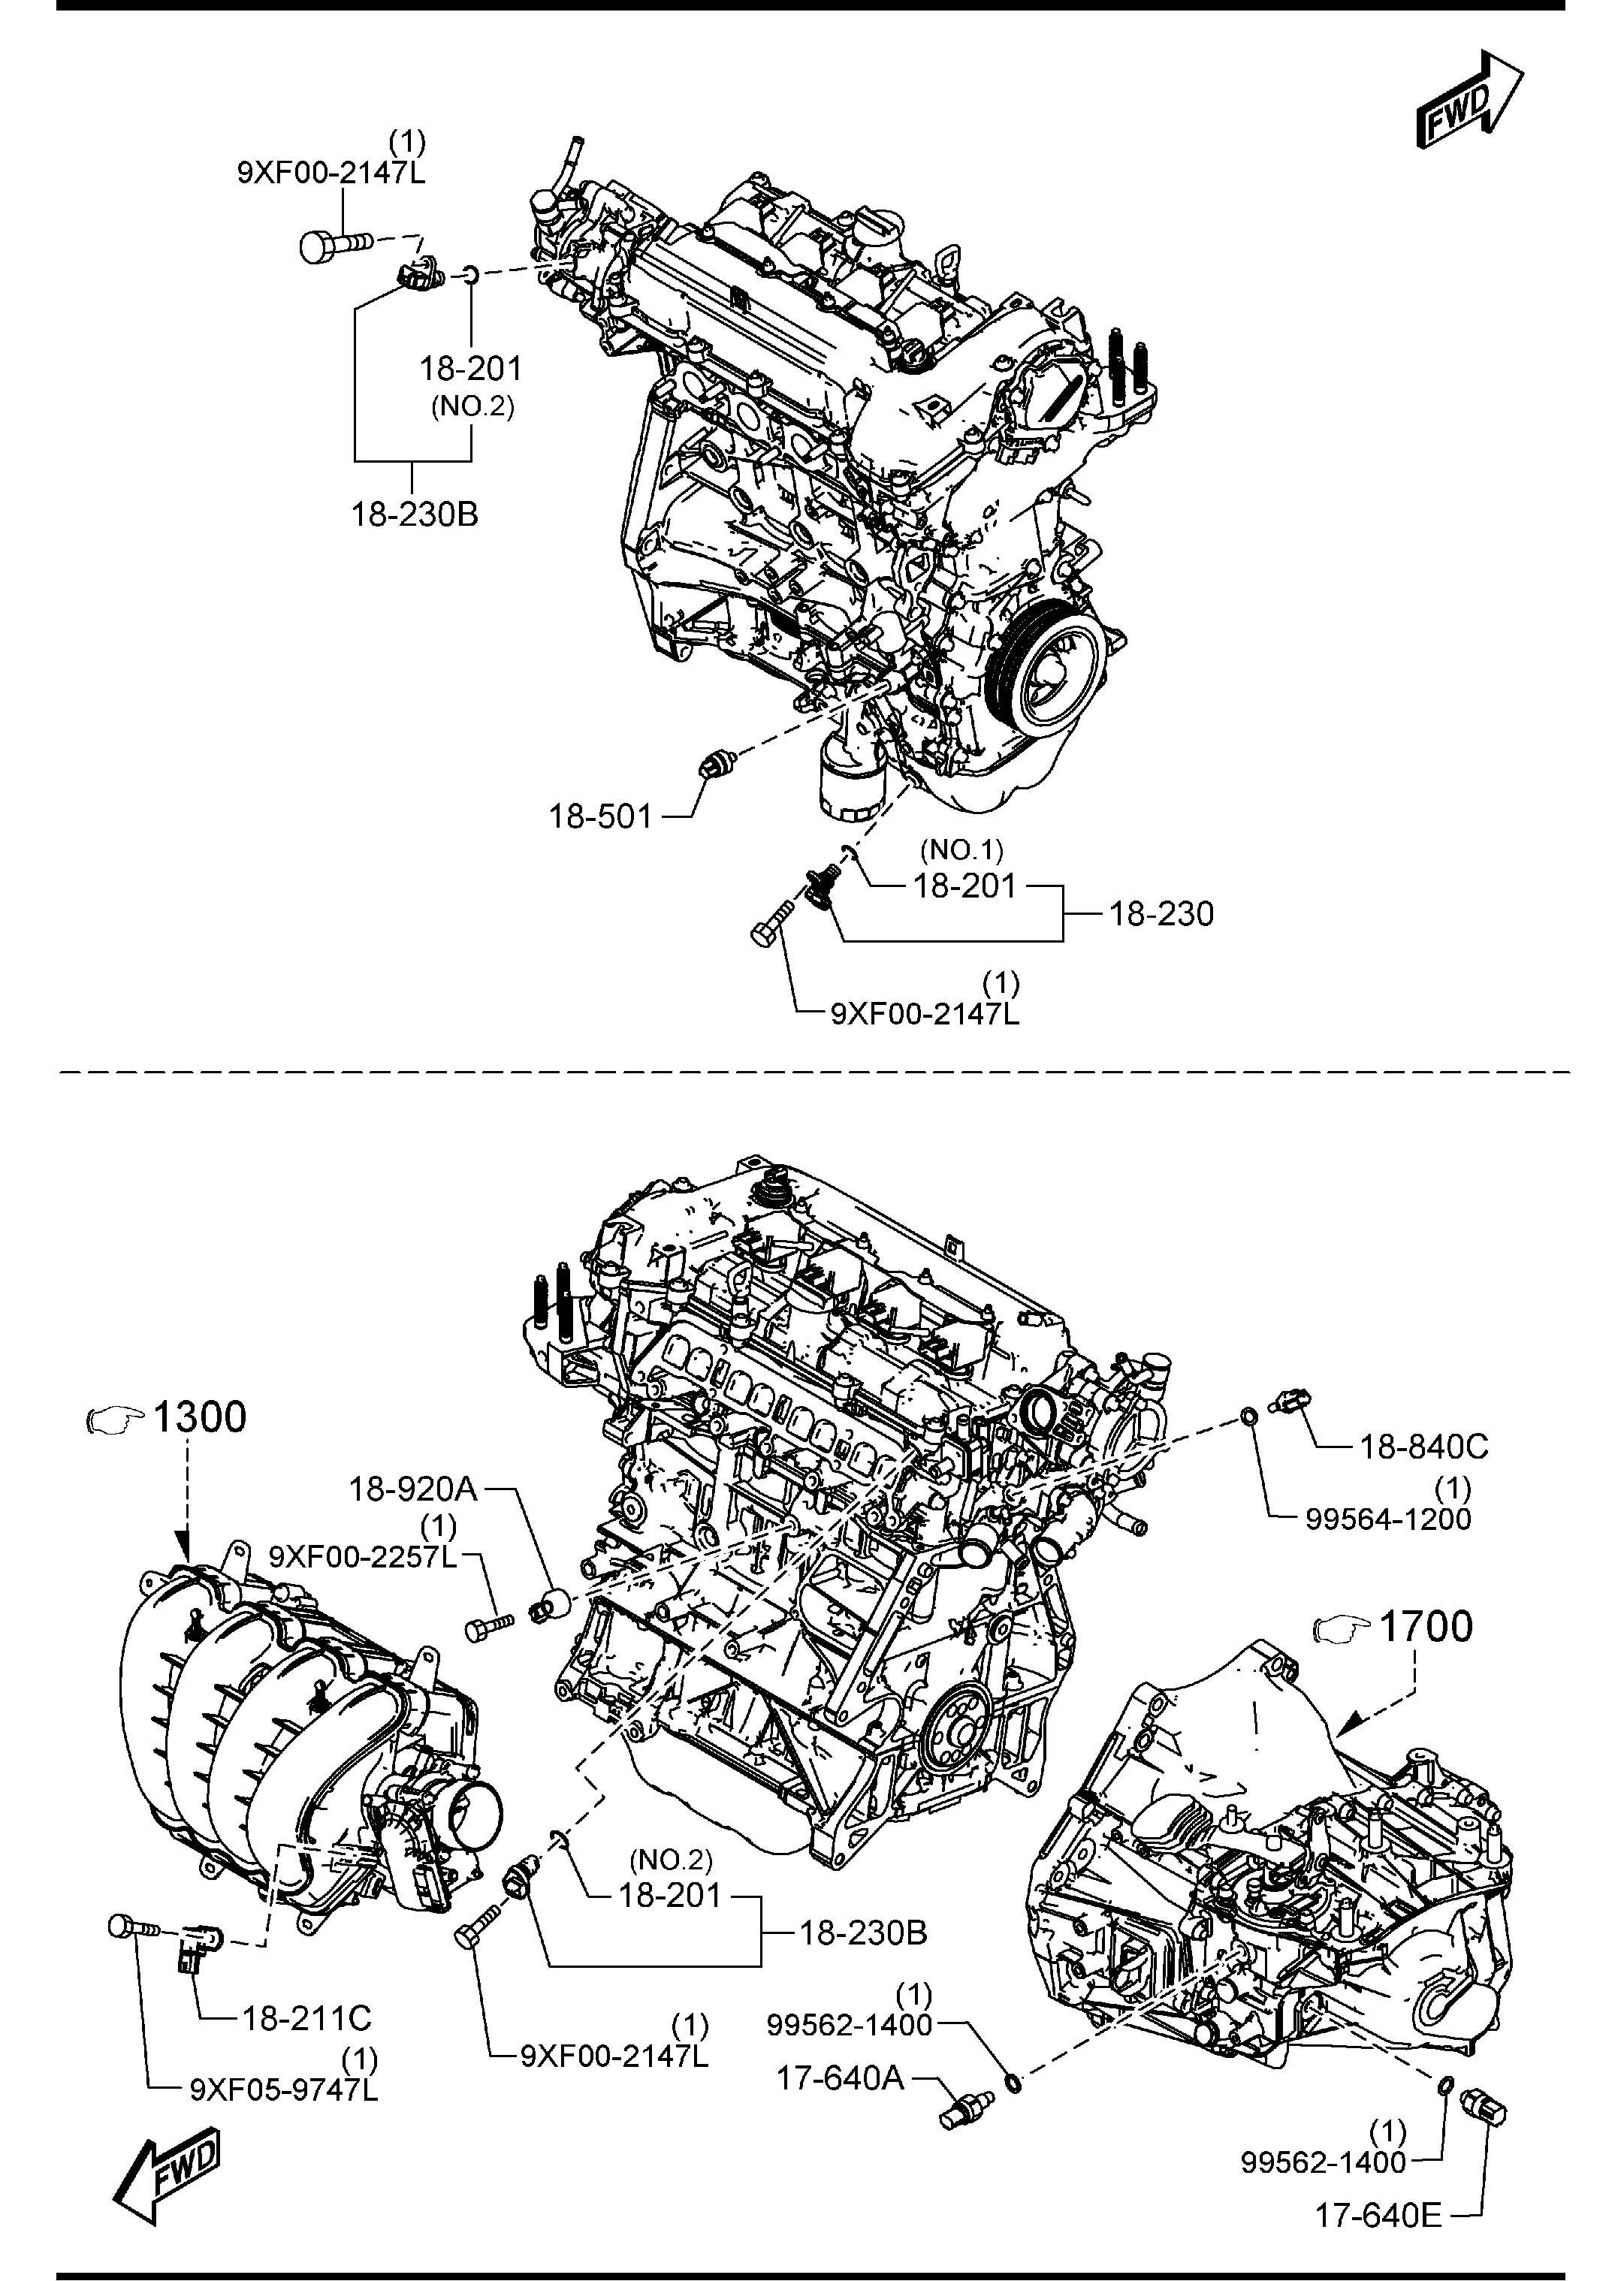 2012 Mazda Mazda 3 Oxygen Sensor (Front, Upper